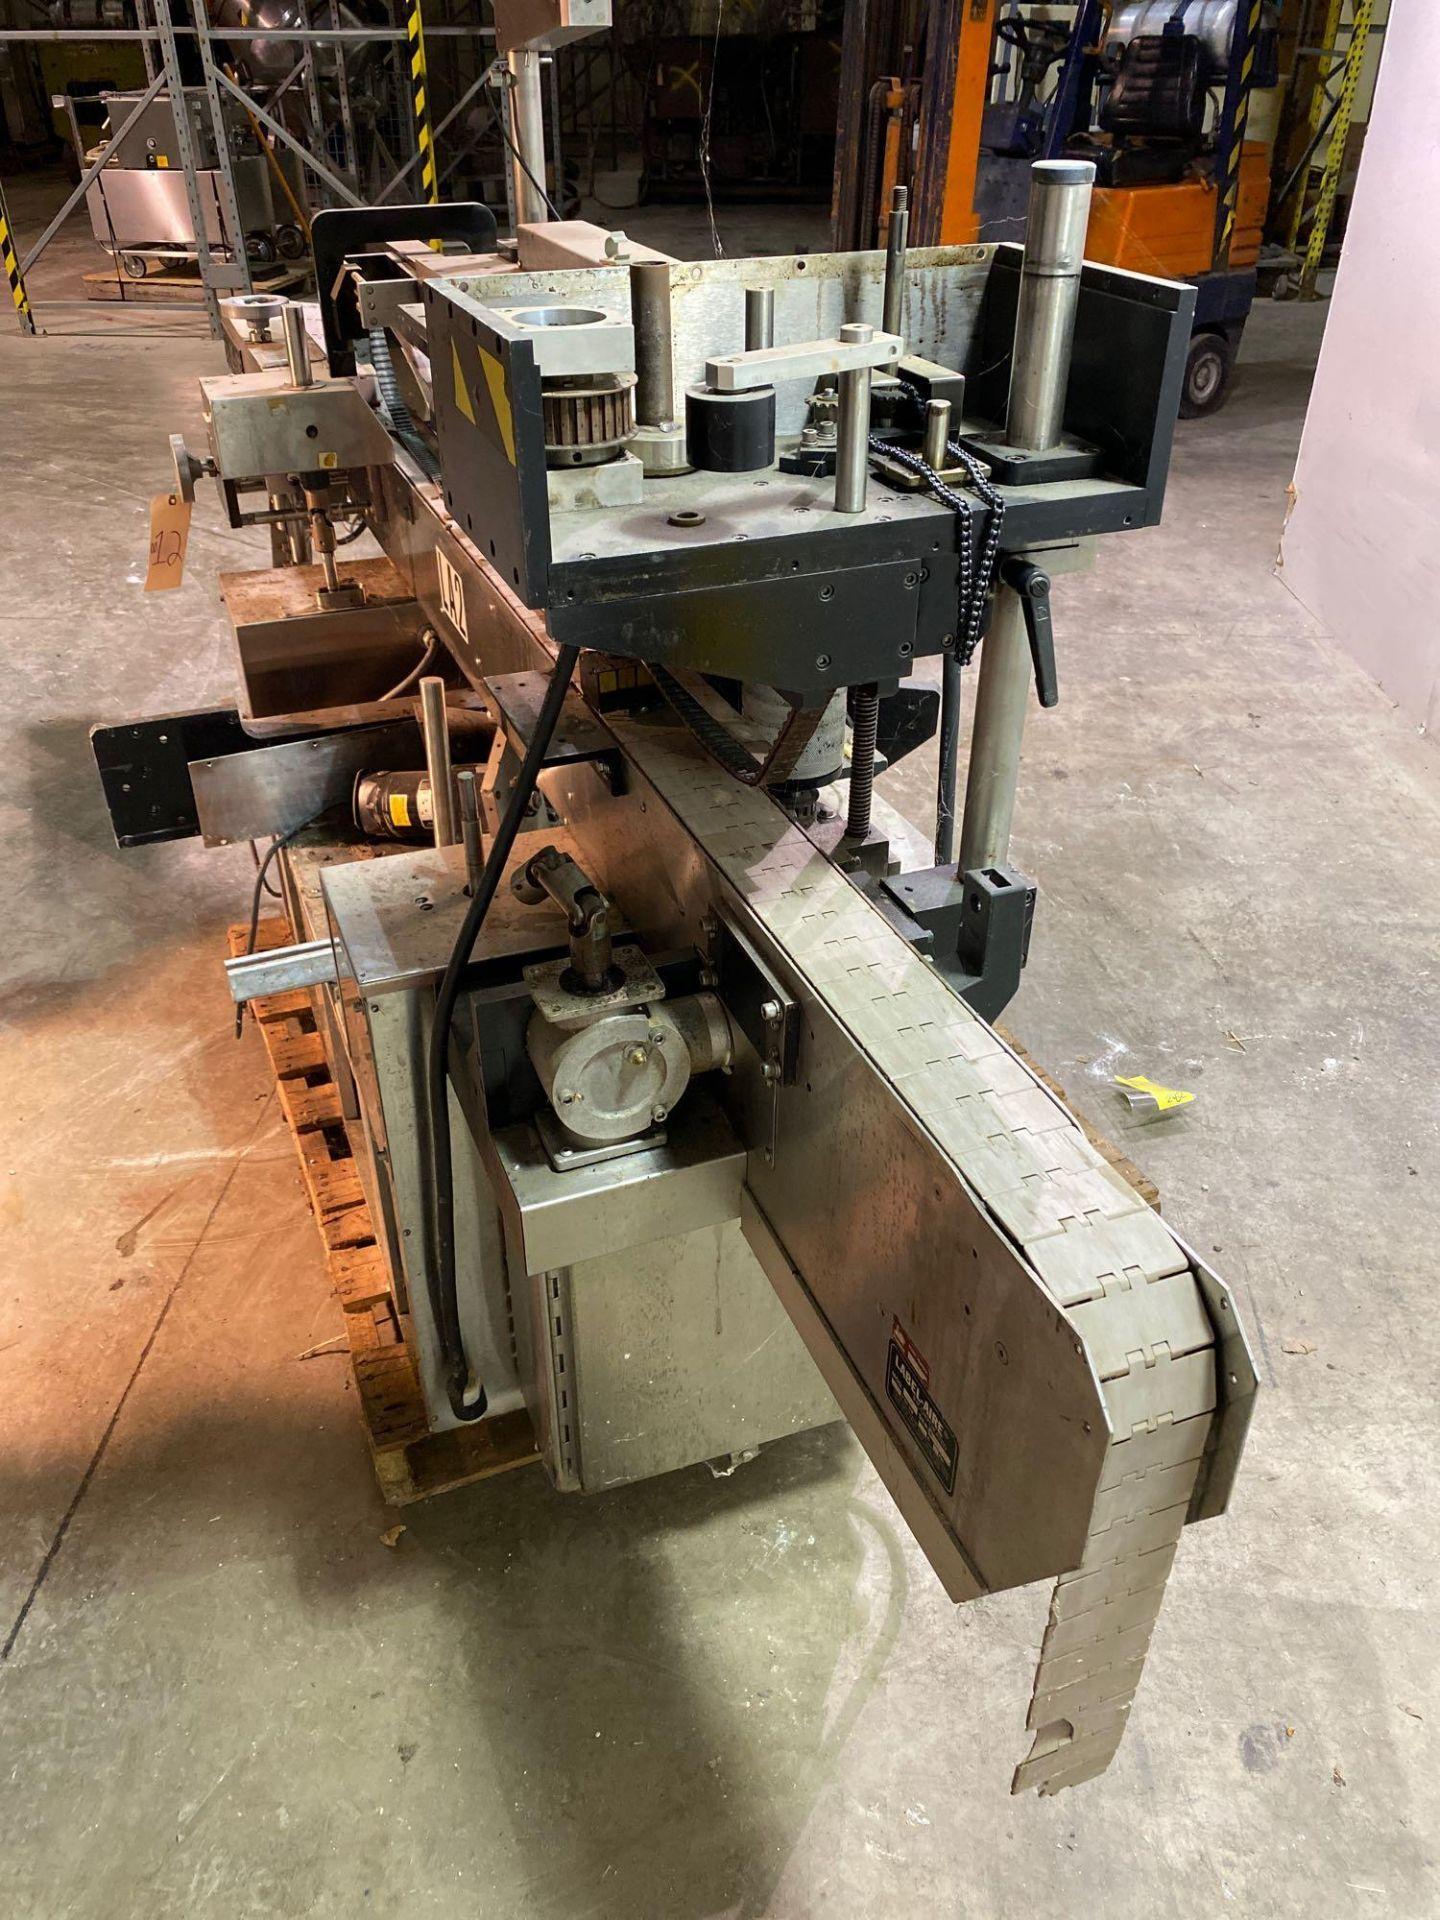 Label-Aire Model 3200 Conveyorized Pressure Sensitive Labeler - Image 6 of 14